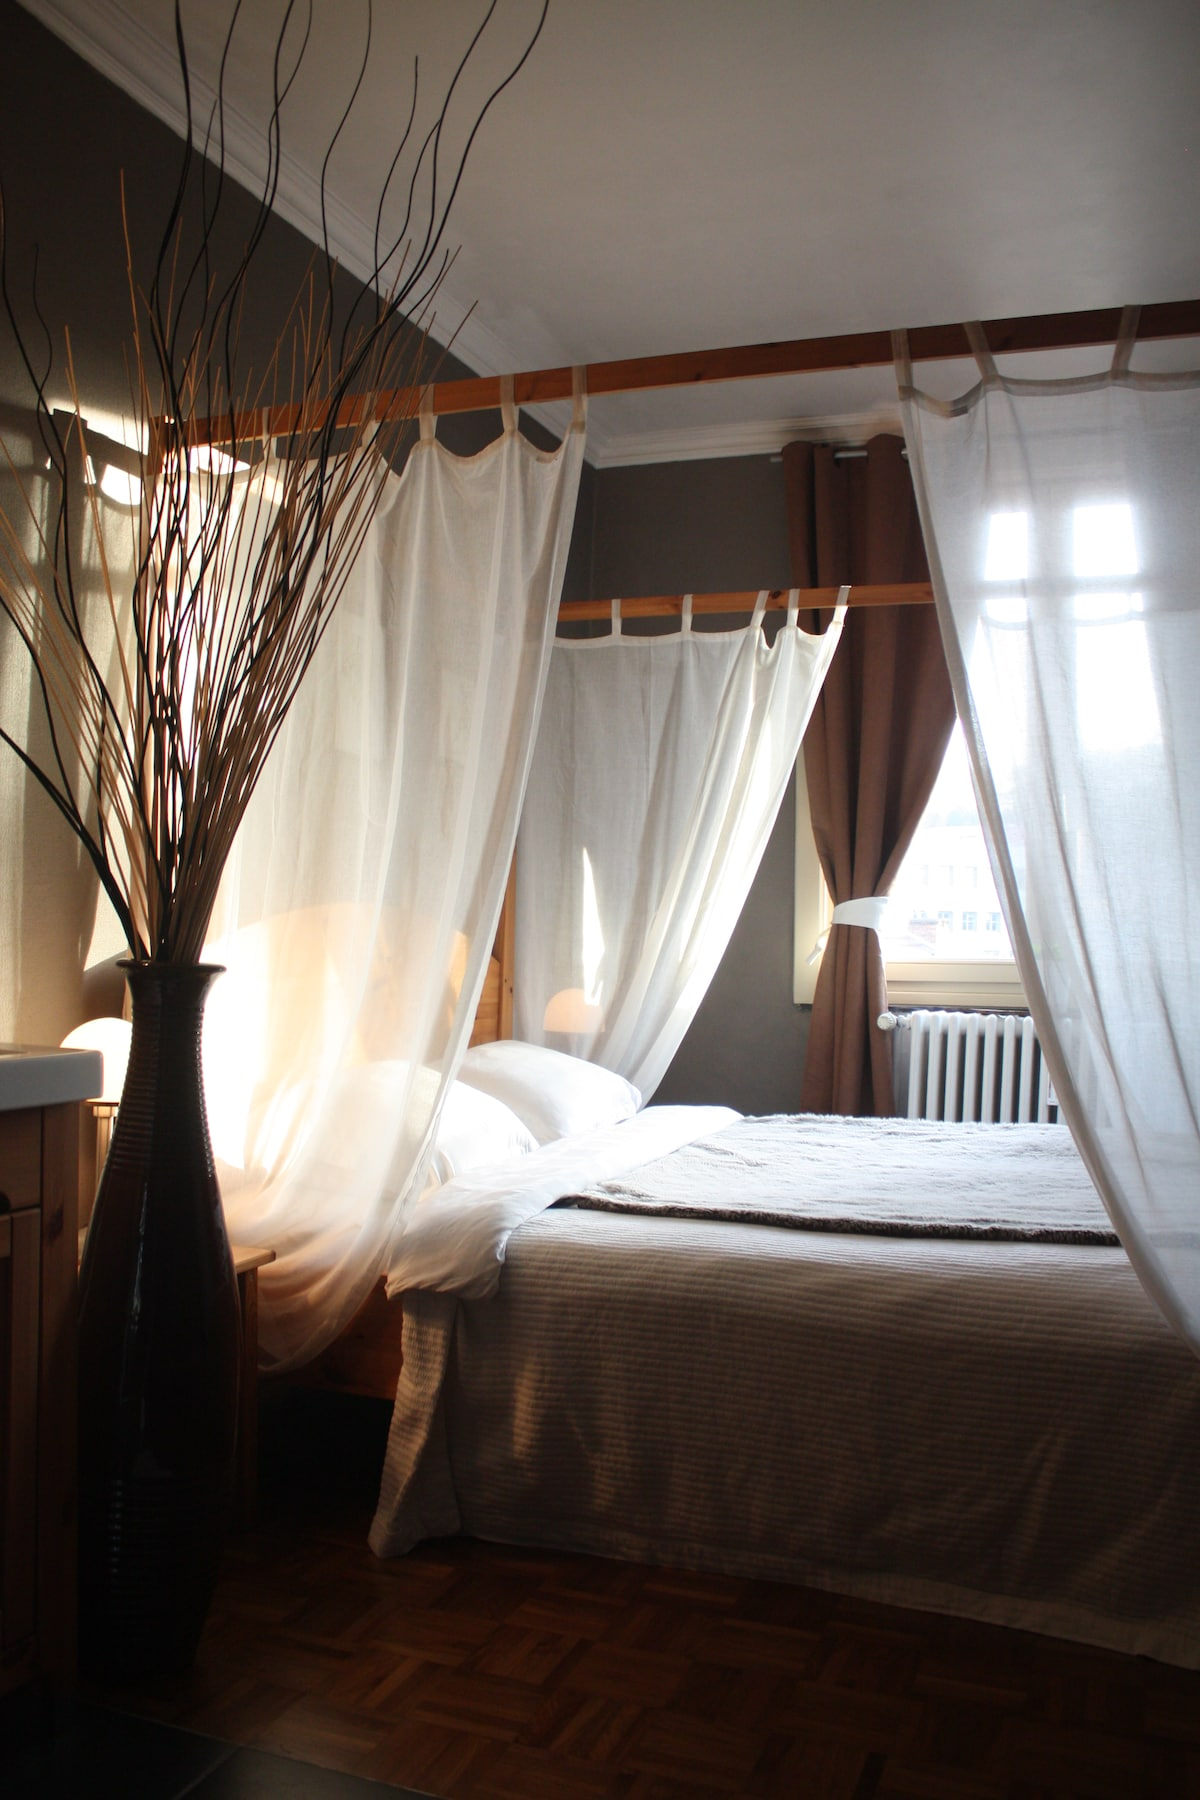 B&B-Romantic Room-Art deco house